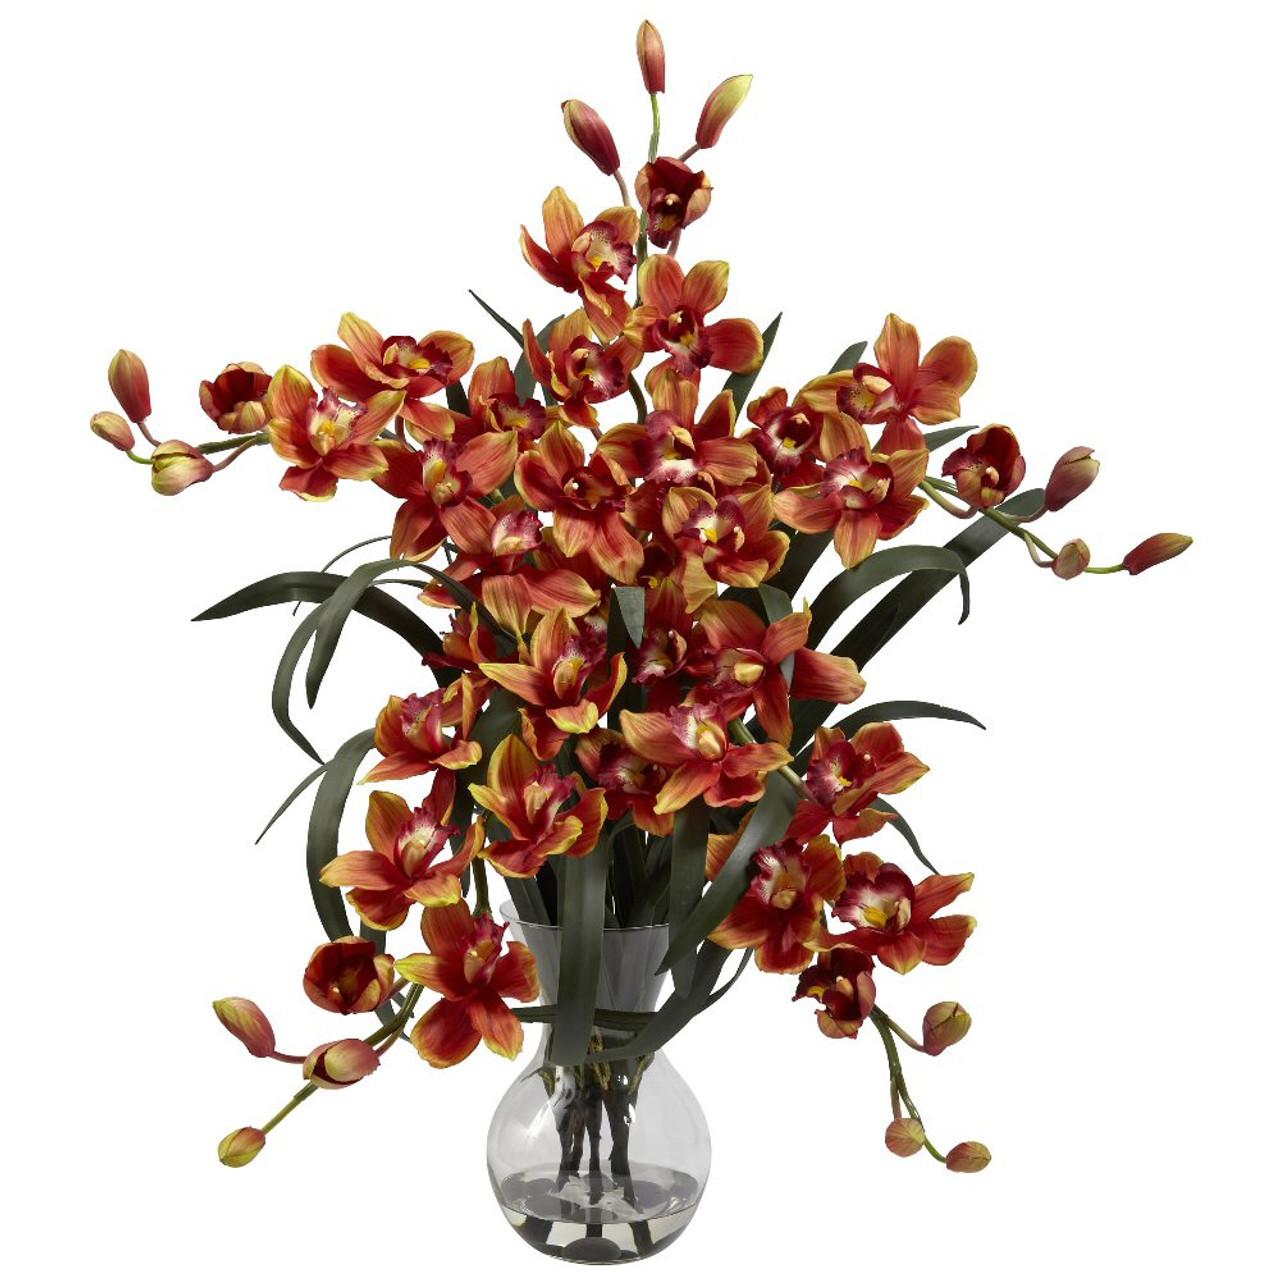 Large Burgundy Cymbidium Silk Flower Arrangement With Vase Artificial Flowers Silk Flowers